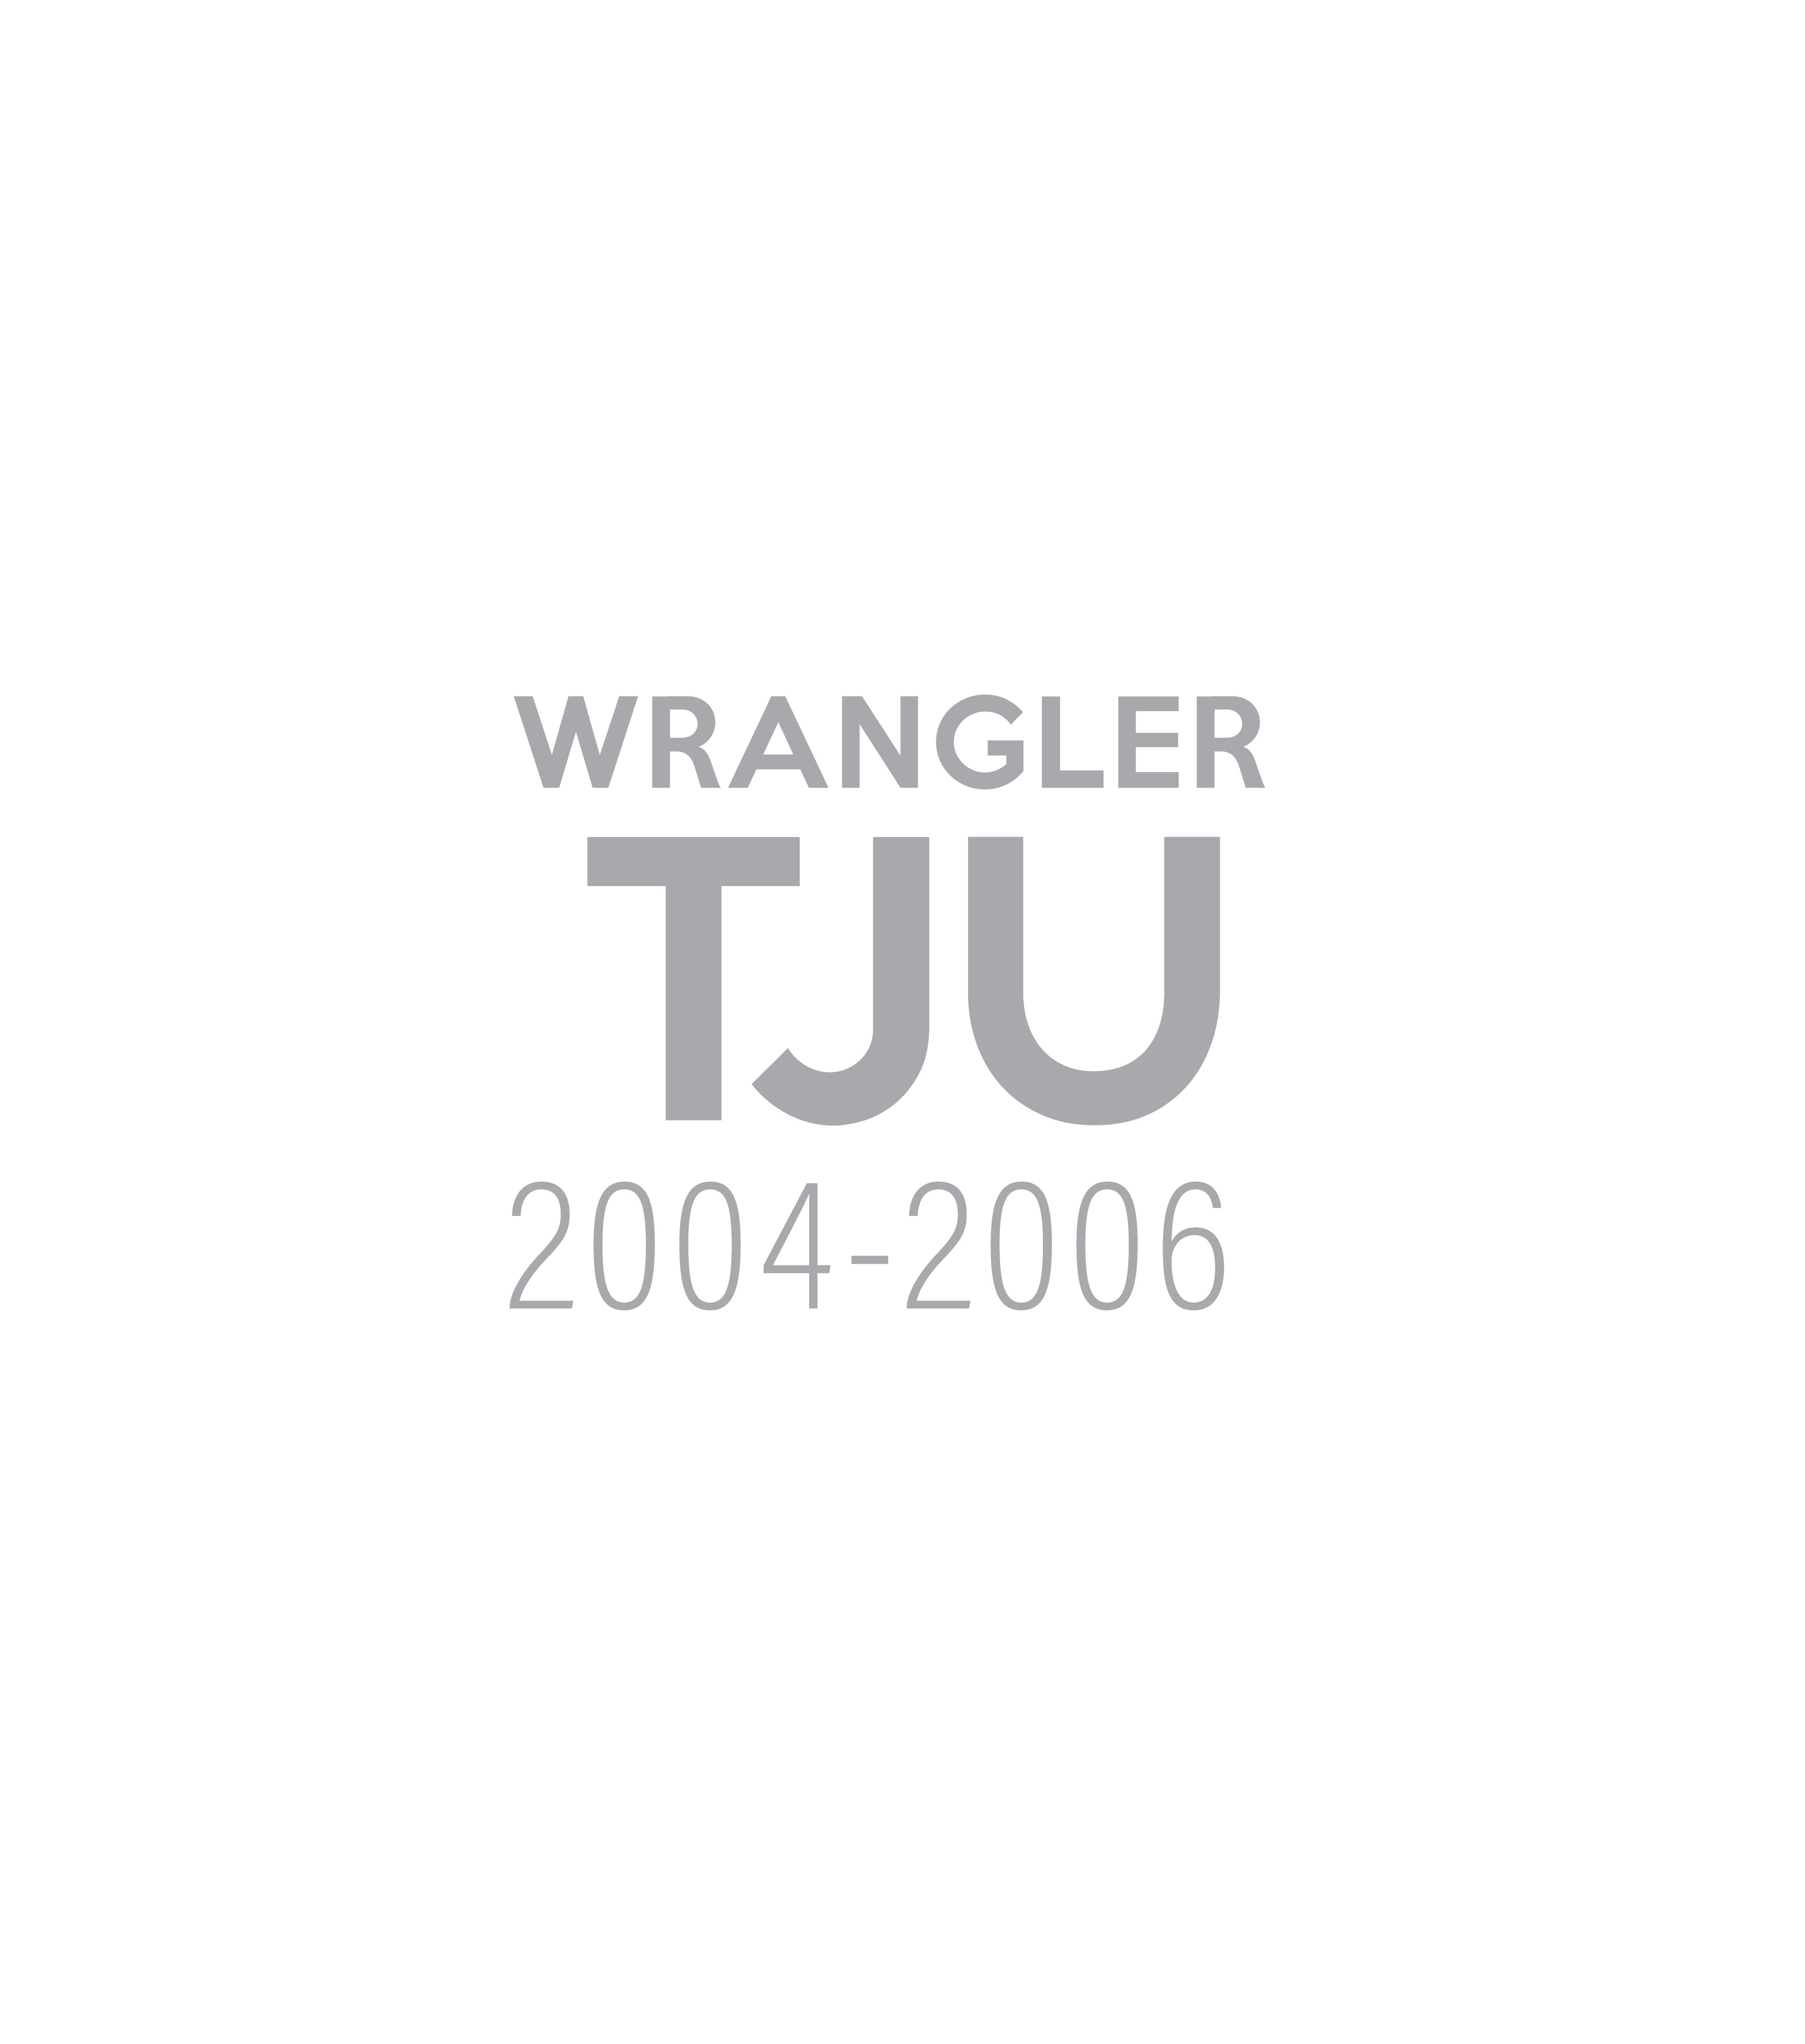 gobi jeep wrangler tju gallery image